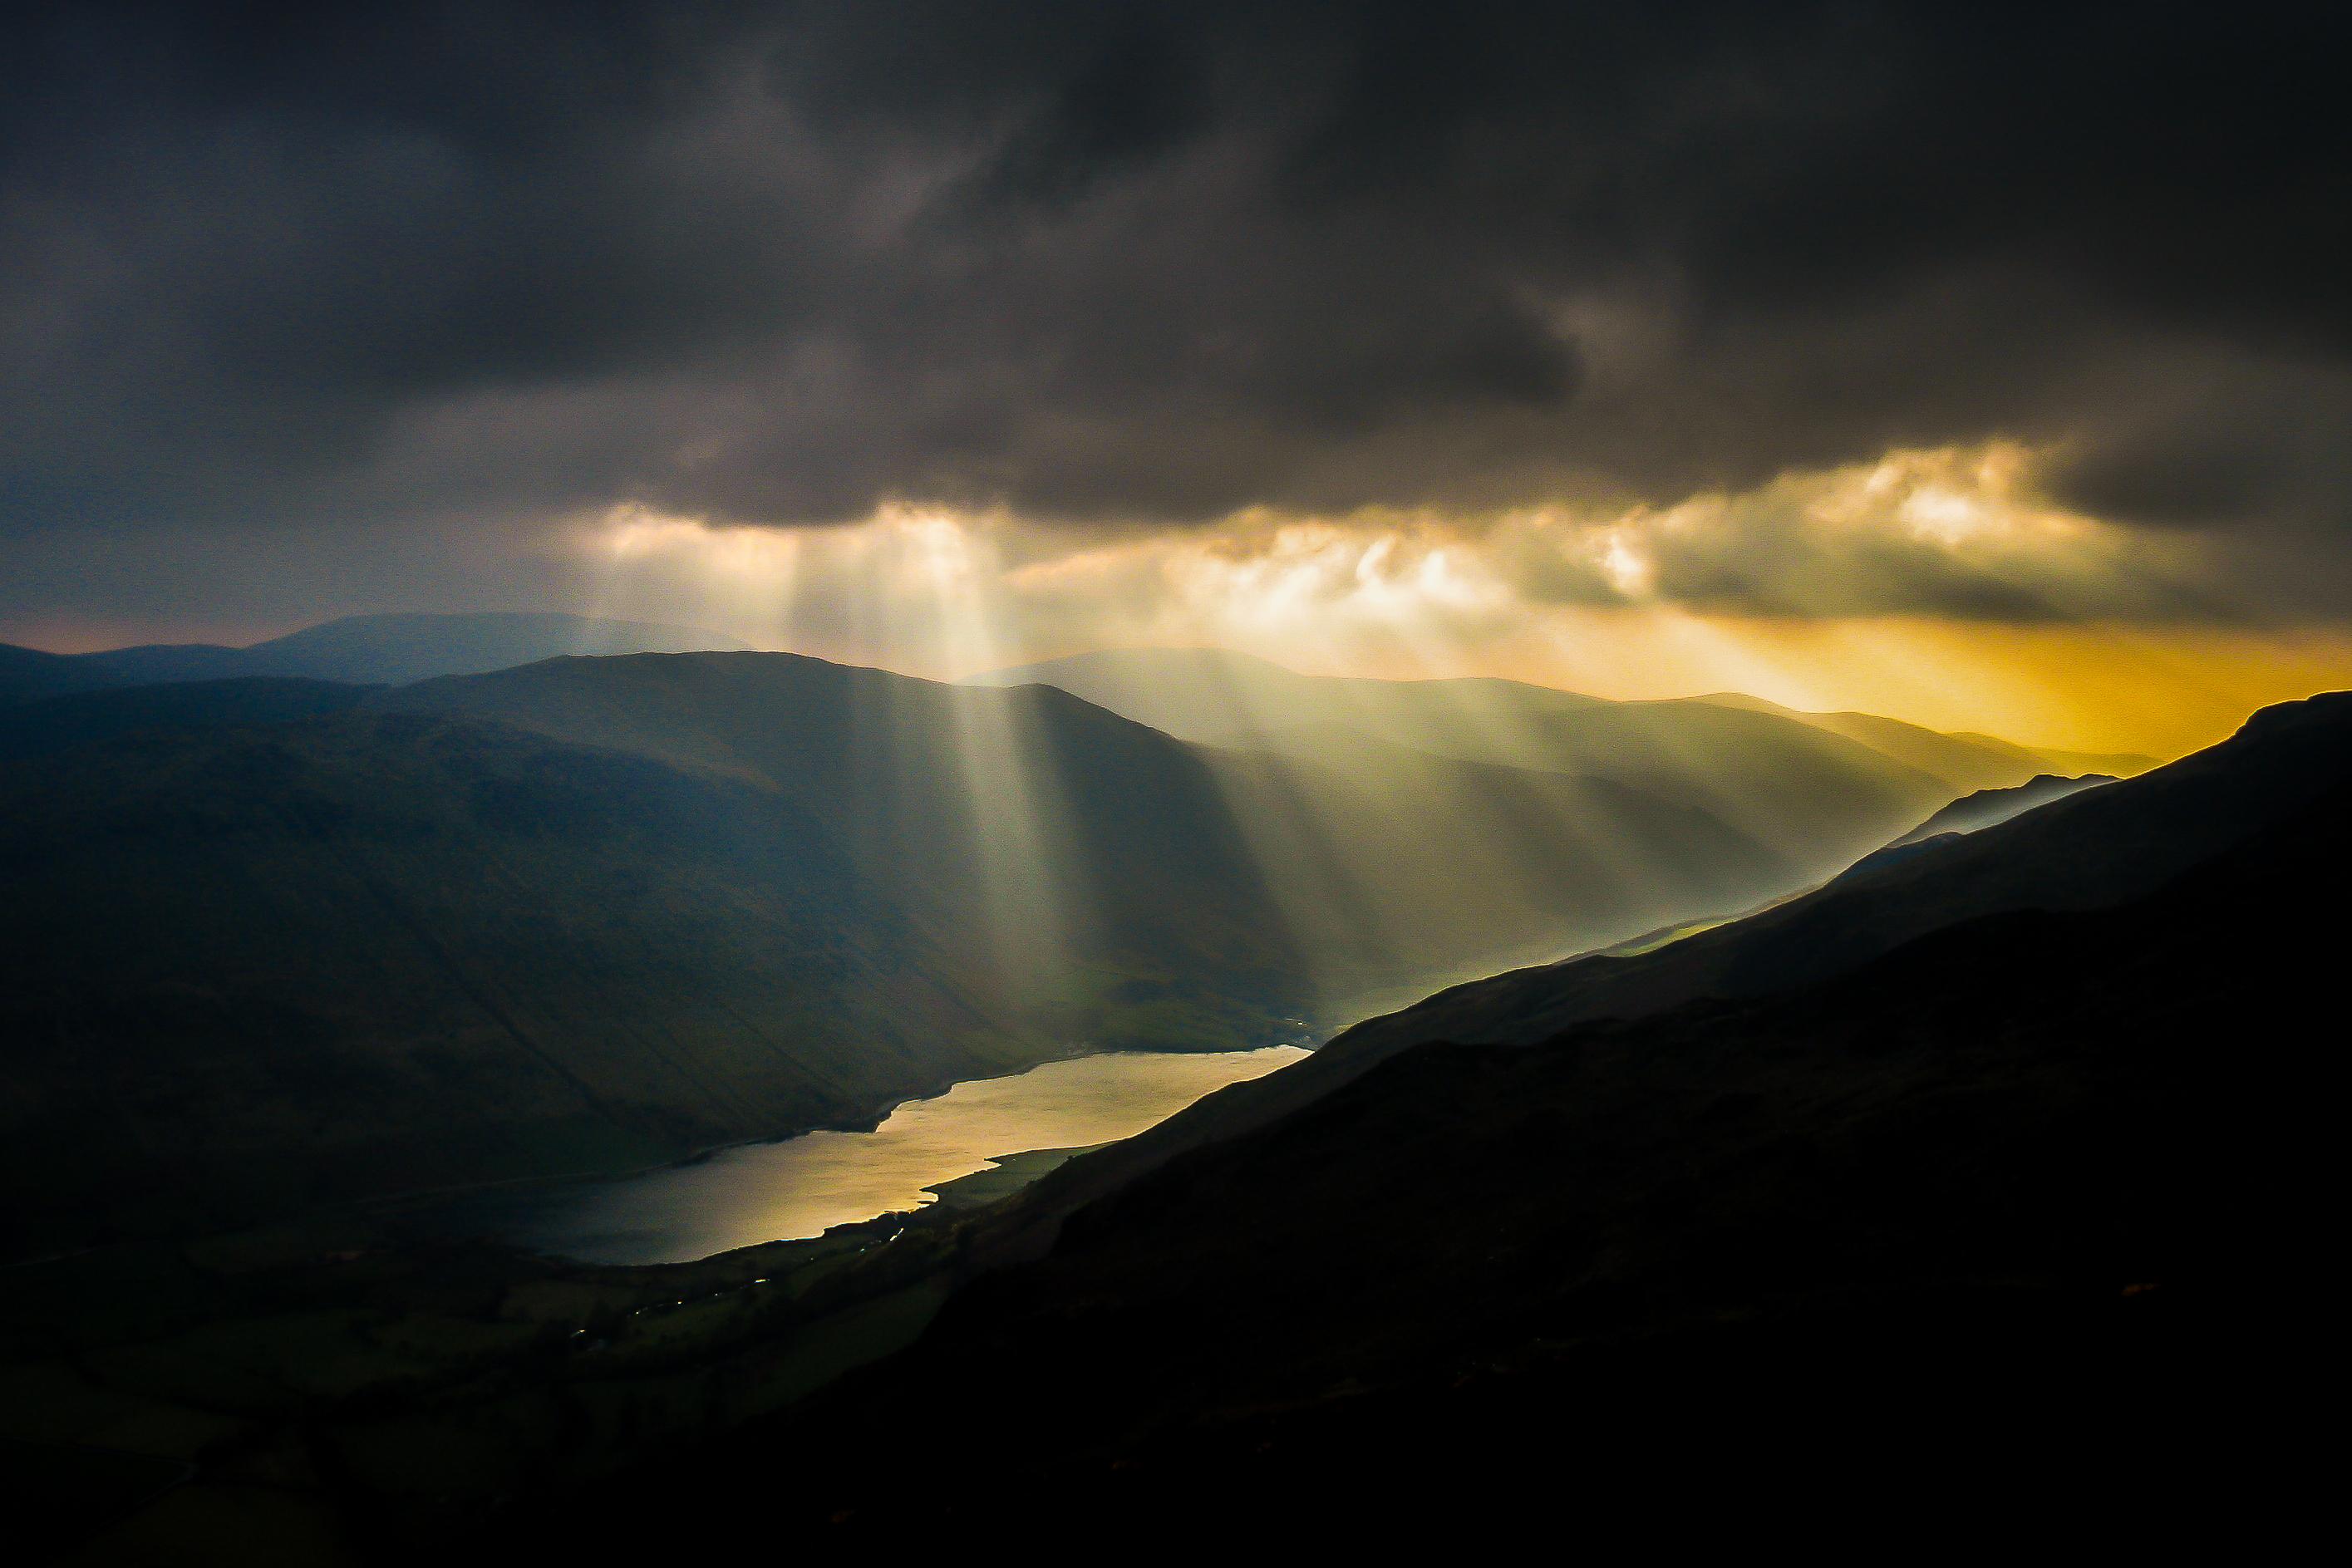 Wallpaper : sunlight, black, mountains, dark, sunset, sea ...